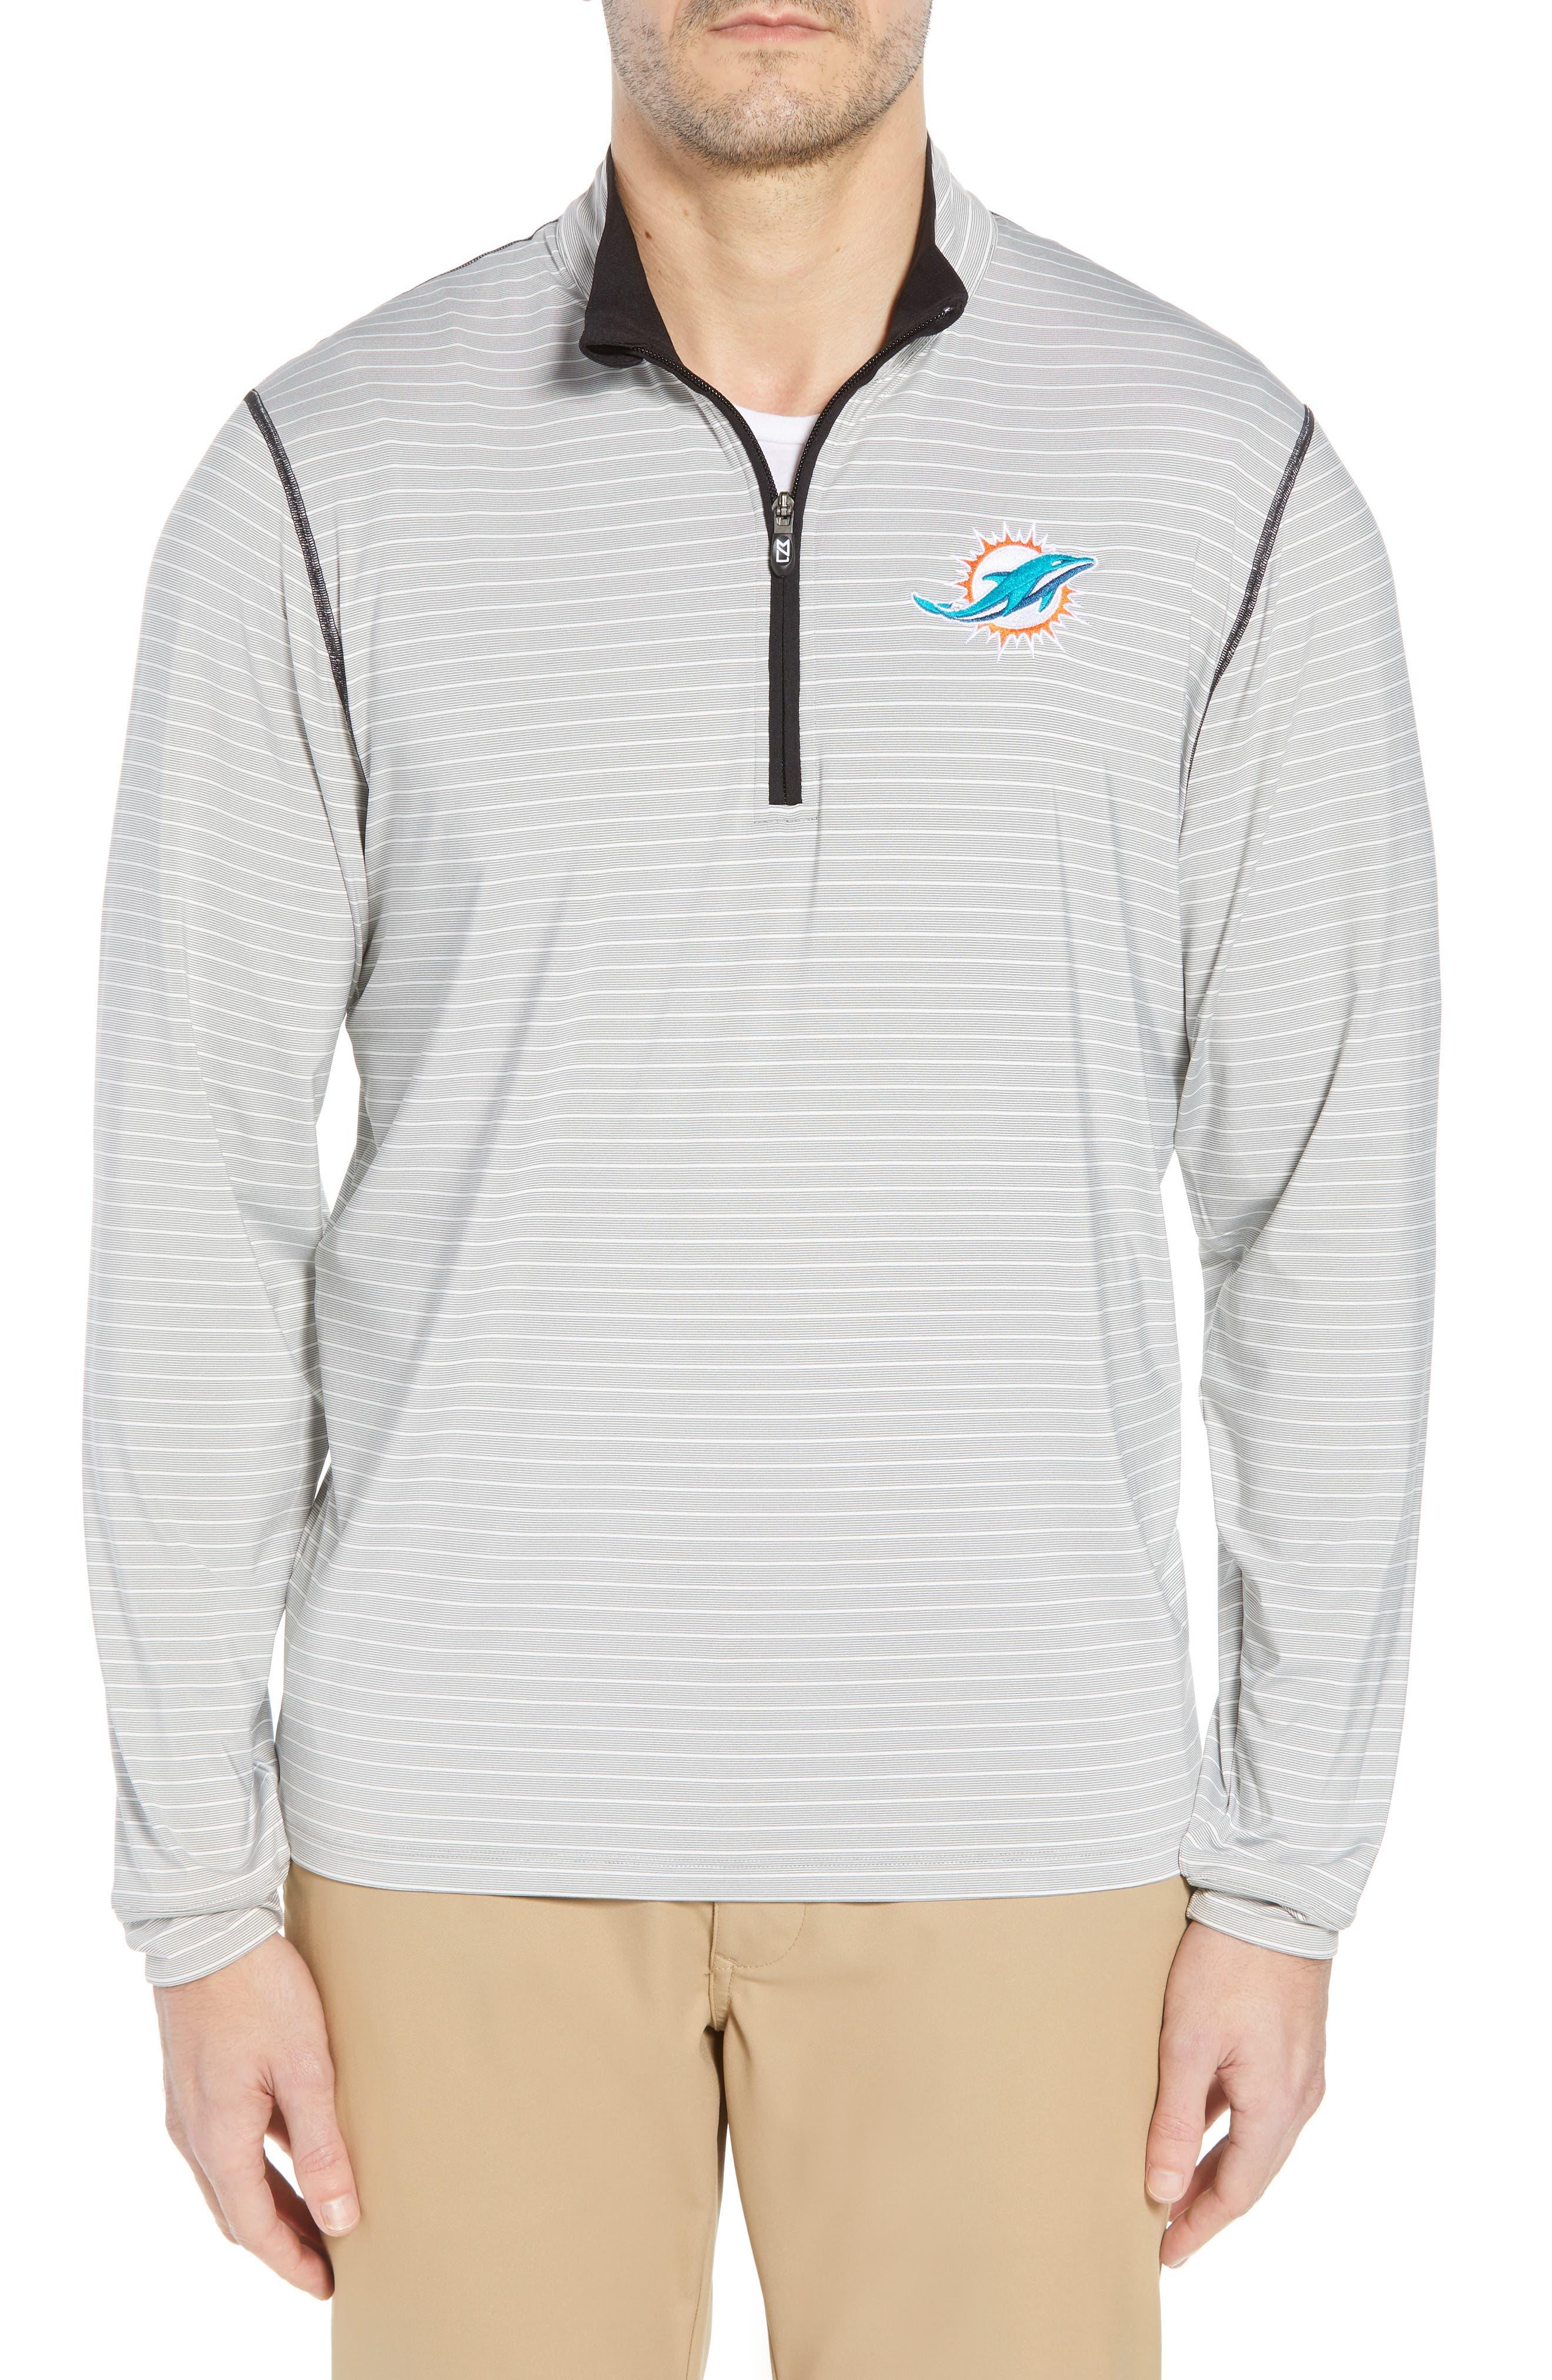 Meridian - Miami Dolphins Regular Fit Half Zip Pullover,                             Main thumbnail 1, color,                             BLACK